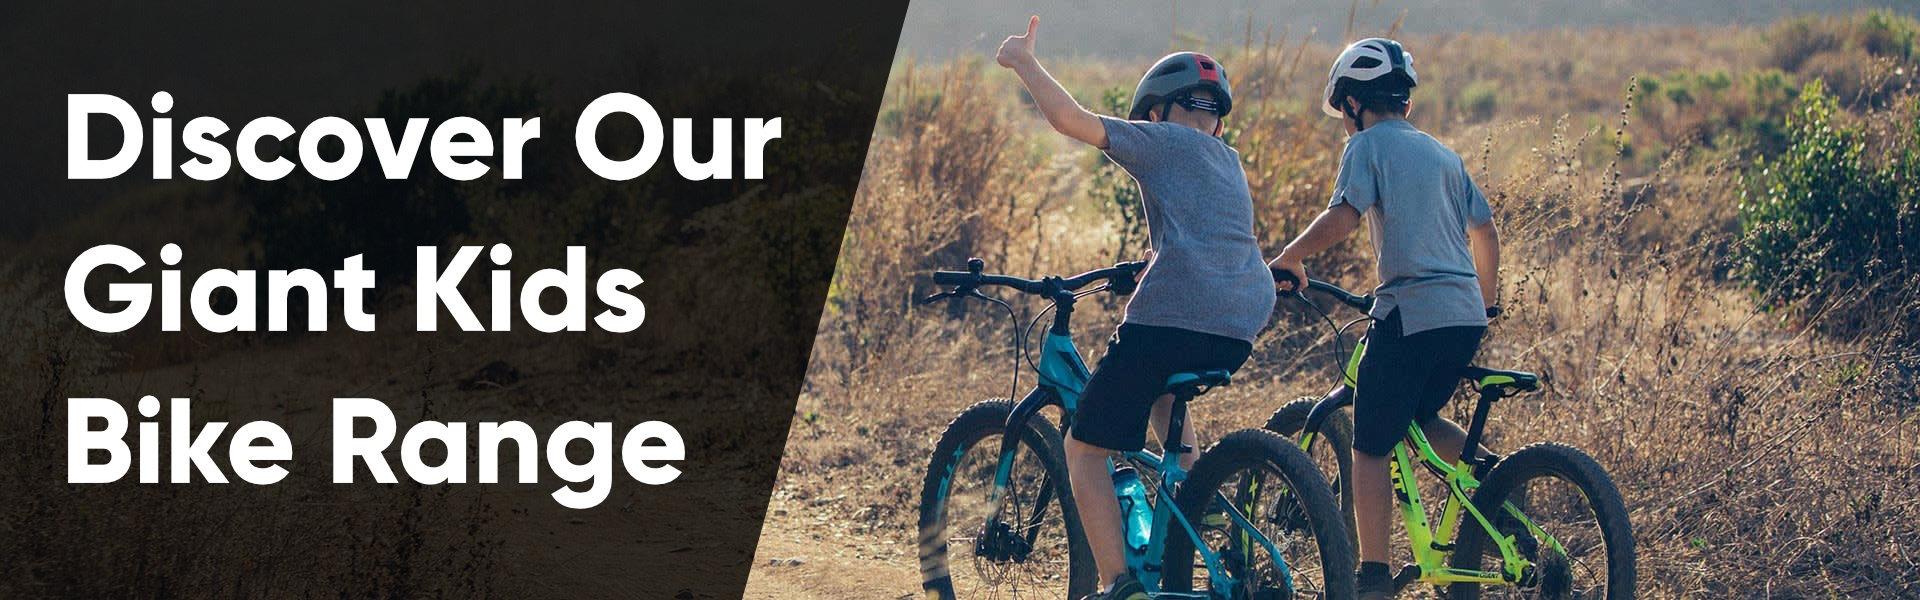 Discover Our Giant Kids Bike Range